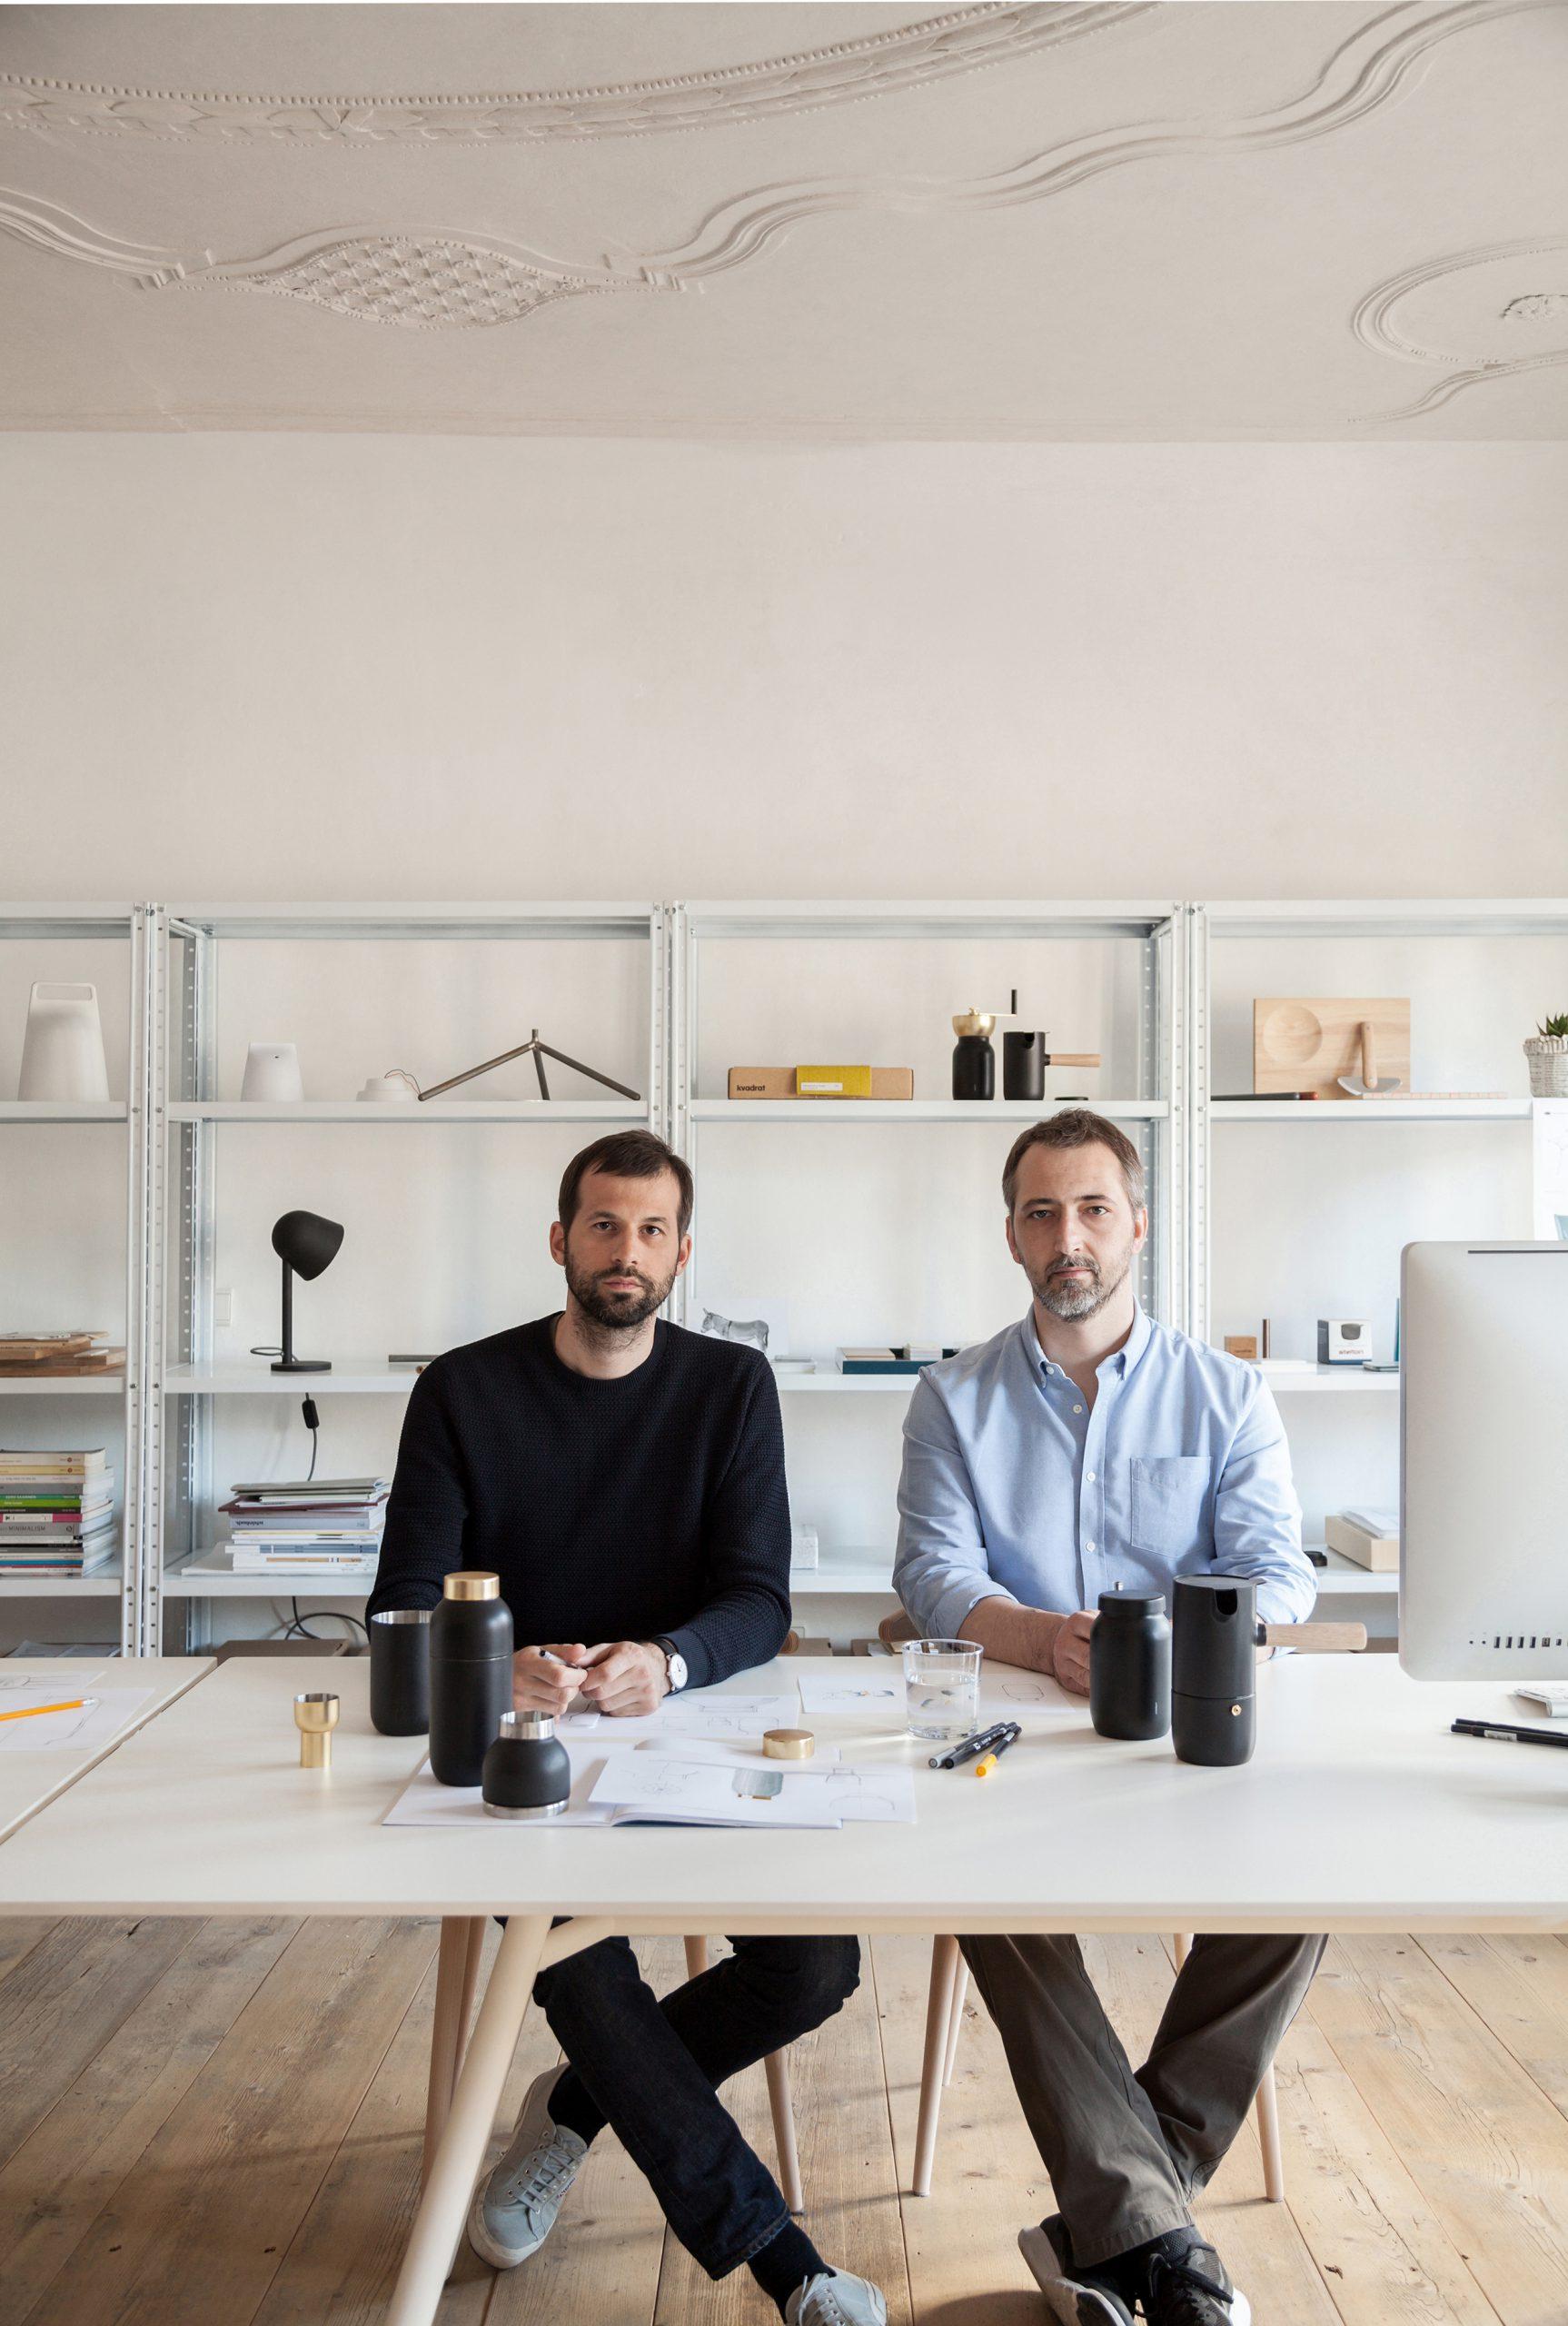 Debiasi Sandri Design Studio by Daniel Debiasi and Federico Sandri